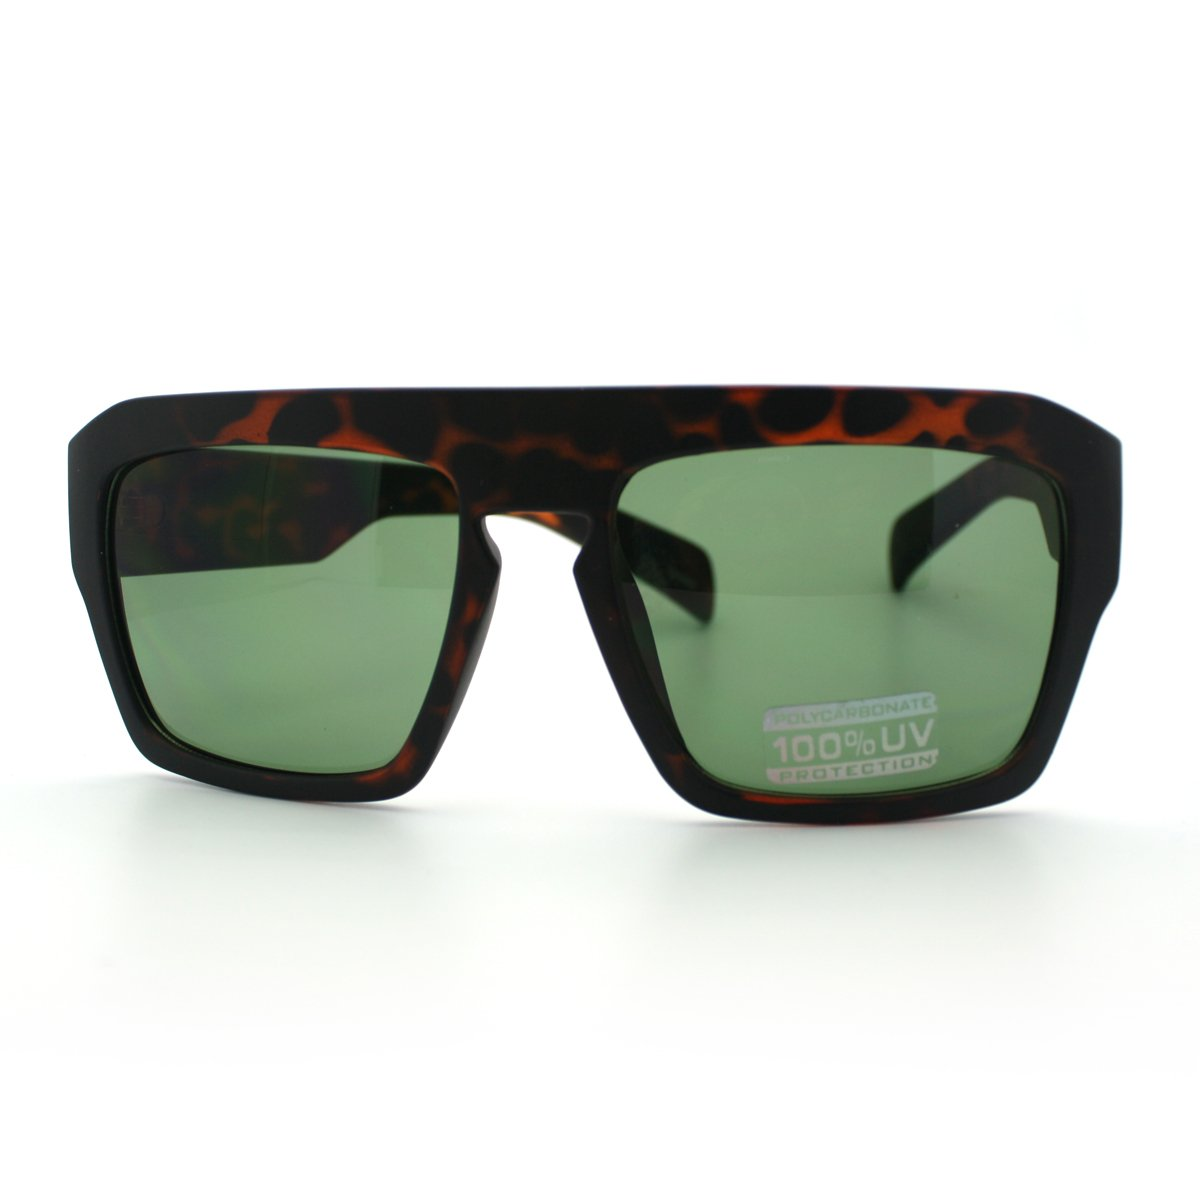 427224d248fa Amazon.com  Tortoise Heavy Frame Flat Top Mobster Keyhole Sunglasses   Clothing